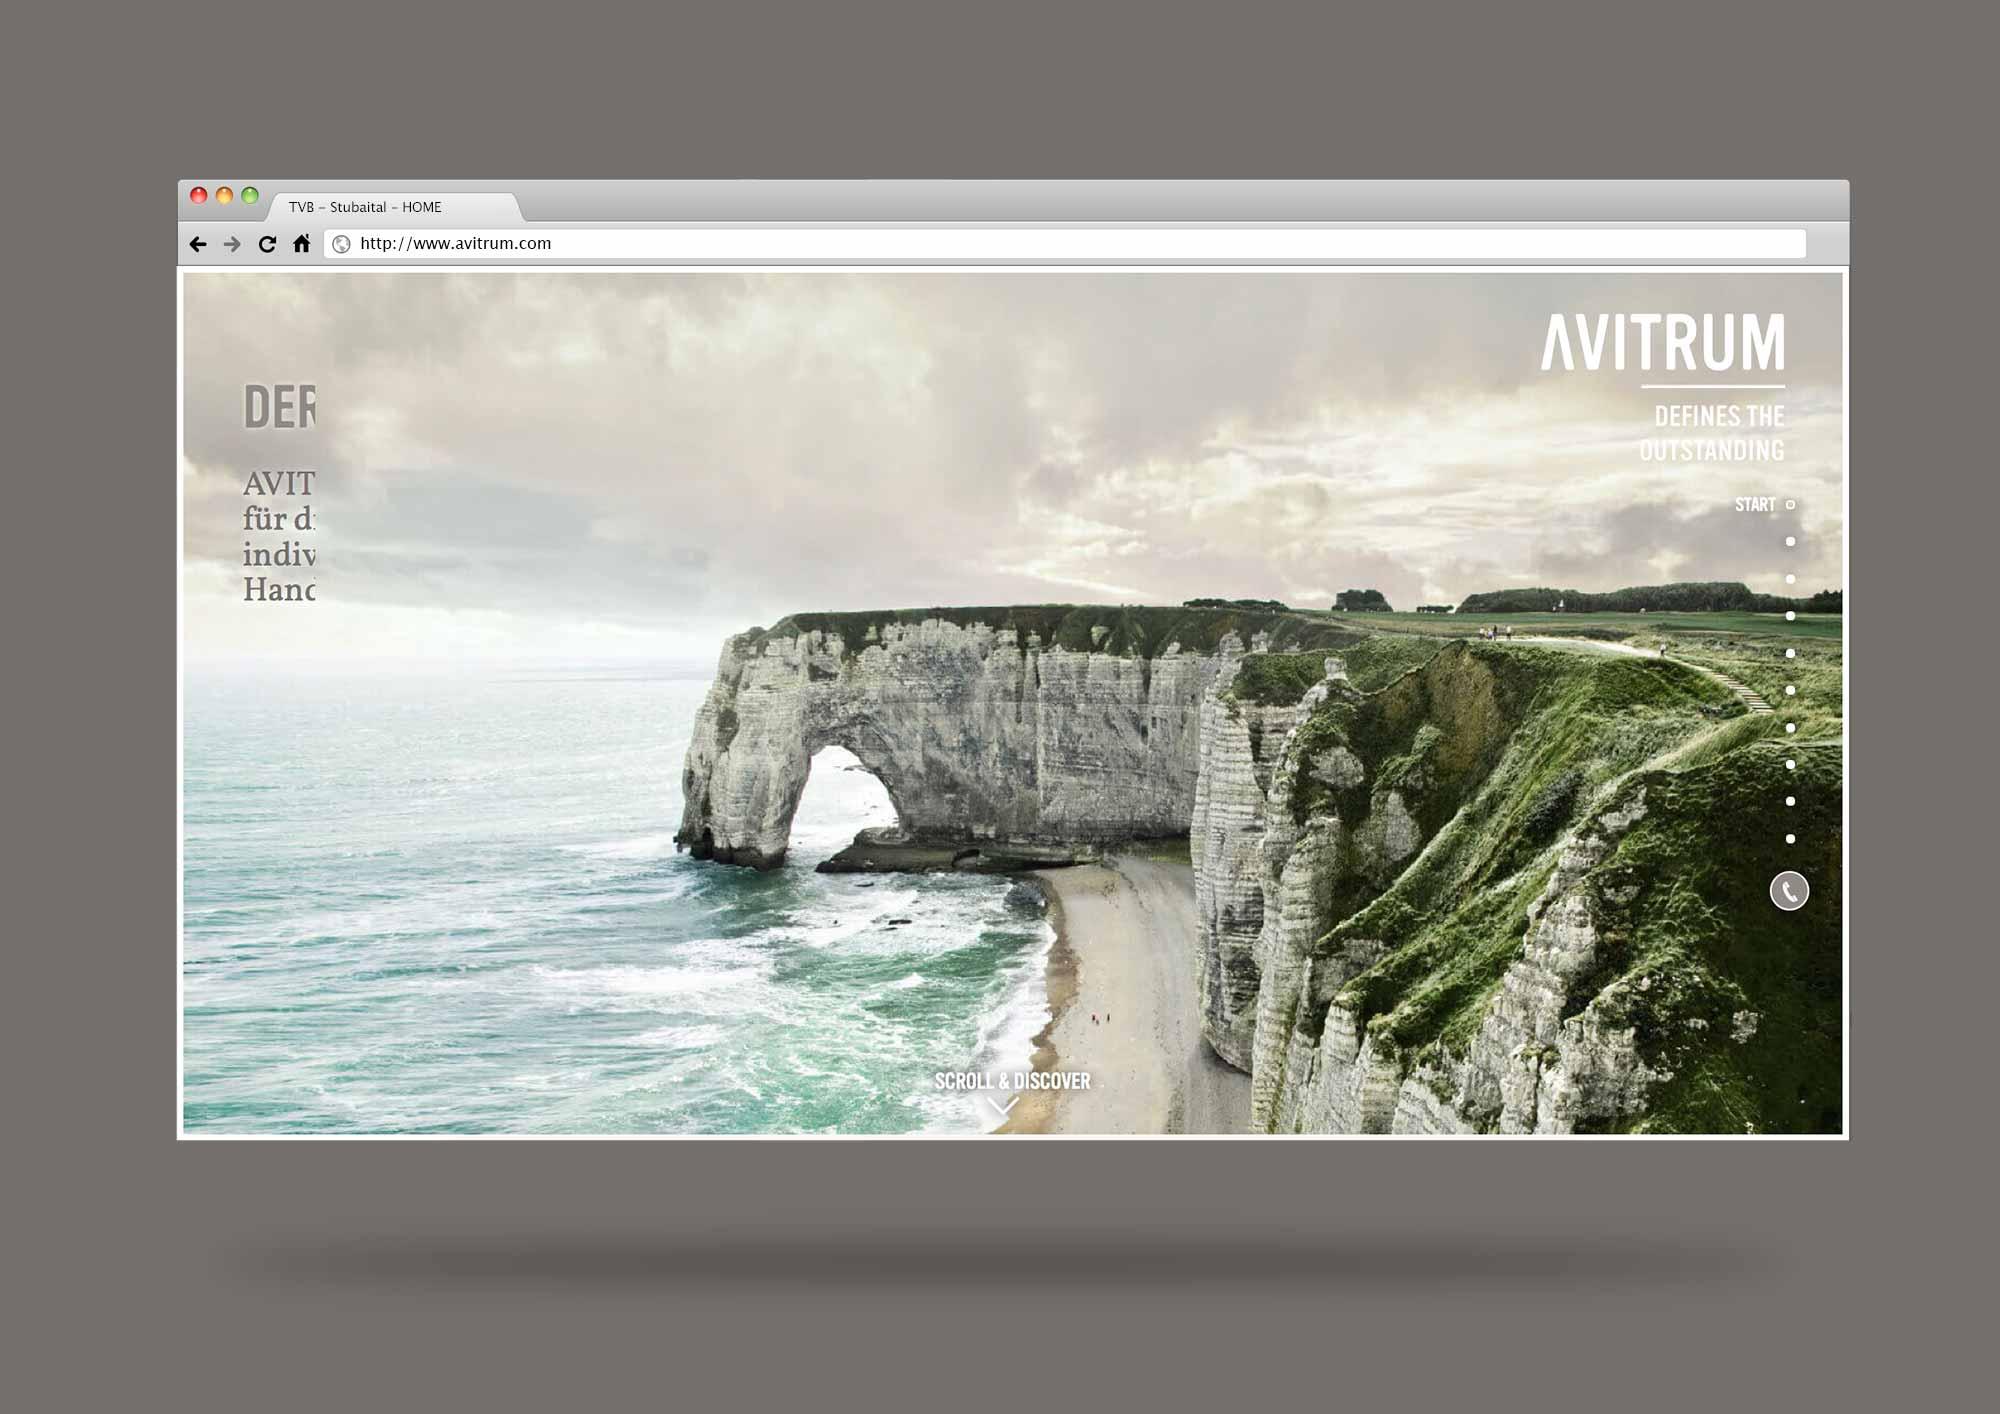 AVITRUM_website_browser_template_01